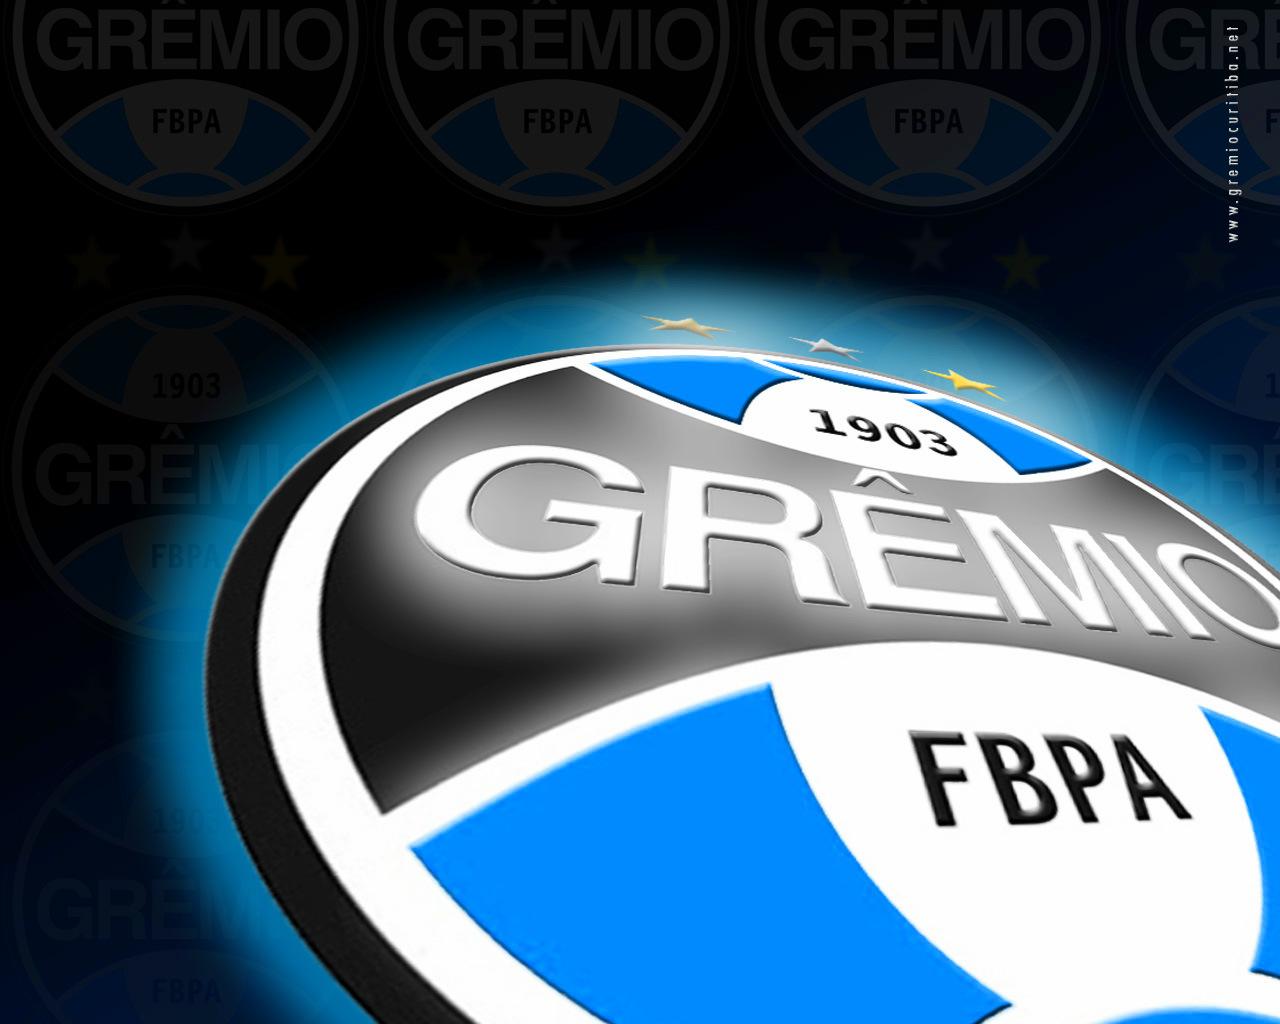 http://4.bp.blogspot.com/-k0CnVDTDrcY/UCmwGC-EkYI/AAAAAAAACQc/tsdLC96R03I/s1600/gremio-wallpaper%2B(3).jpg